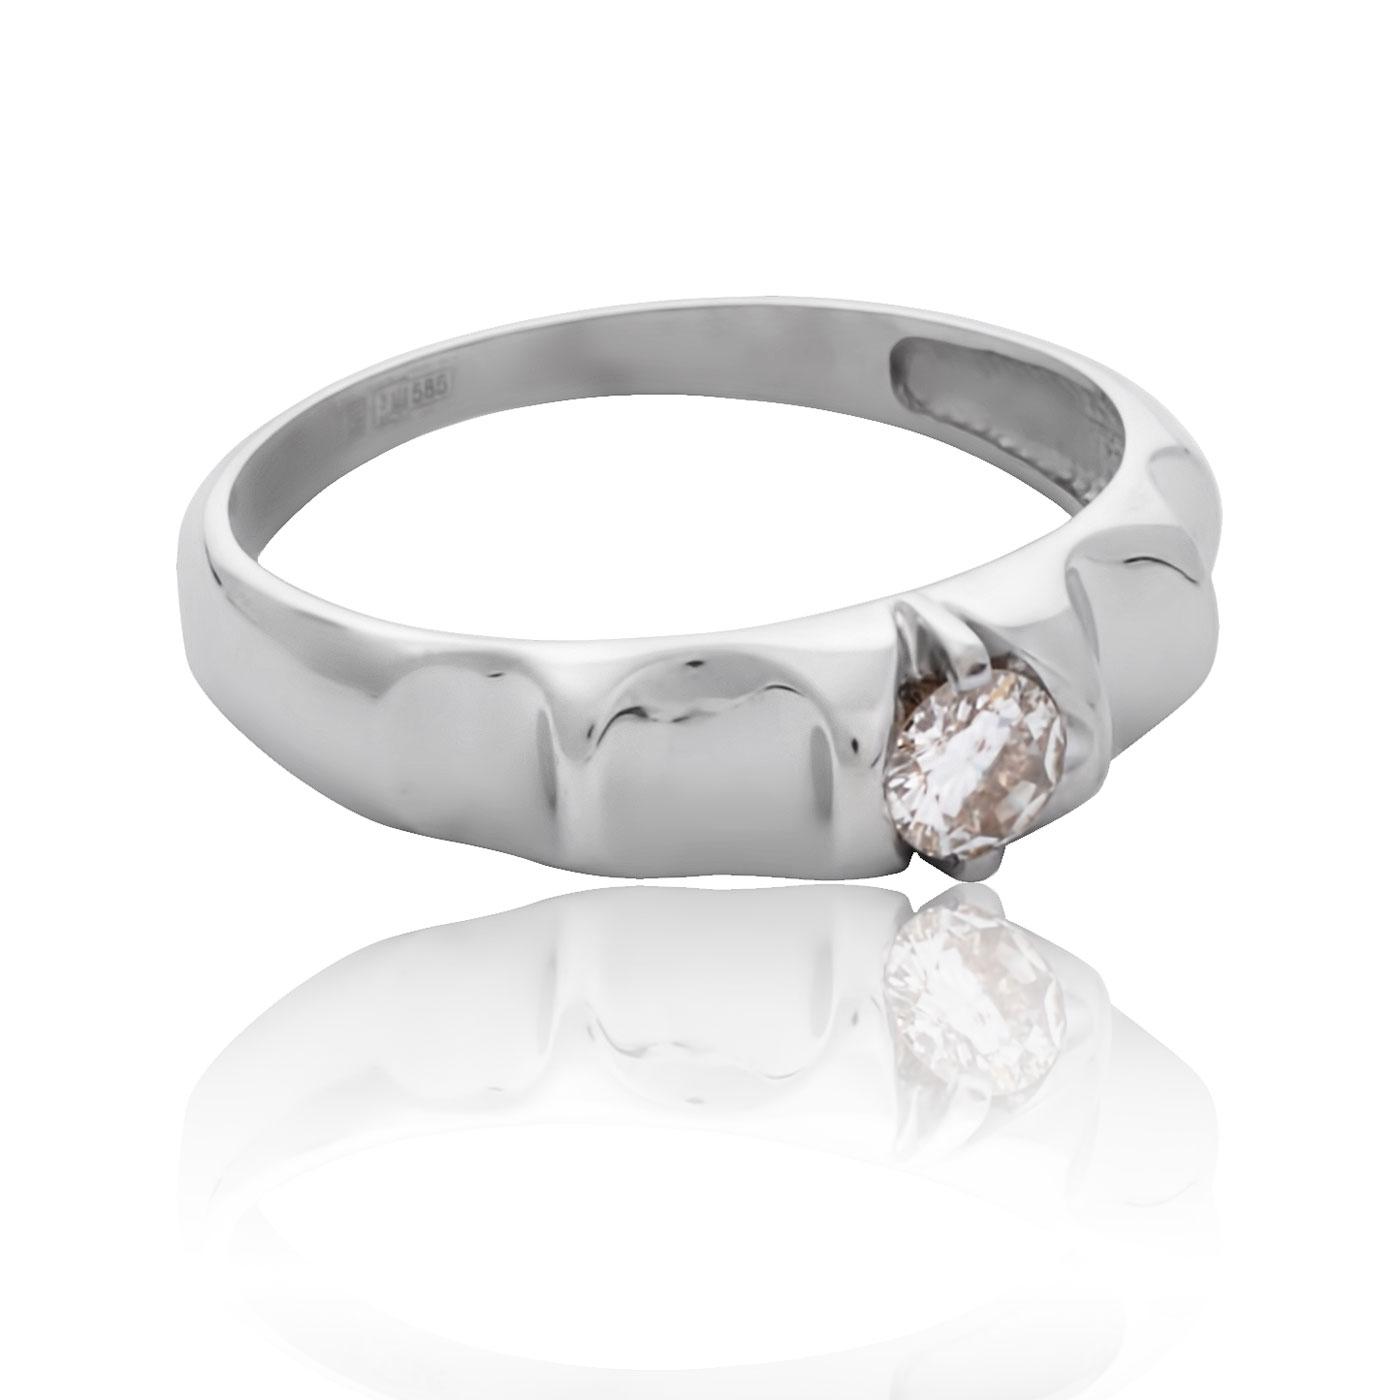 Золотое кольцо с бриллиантом 0.22 карата «Адамант»